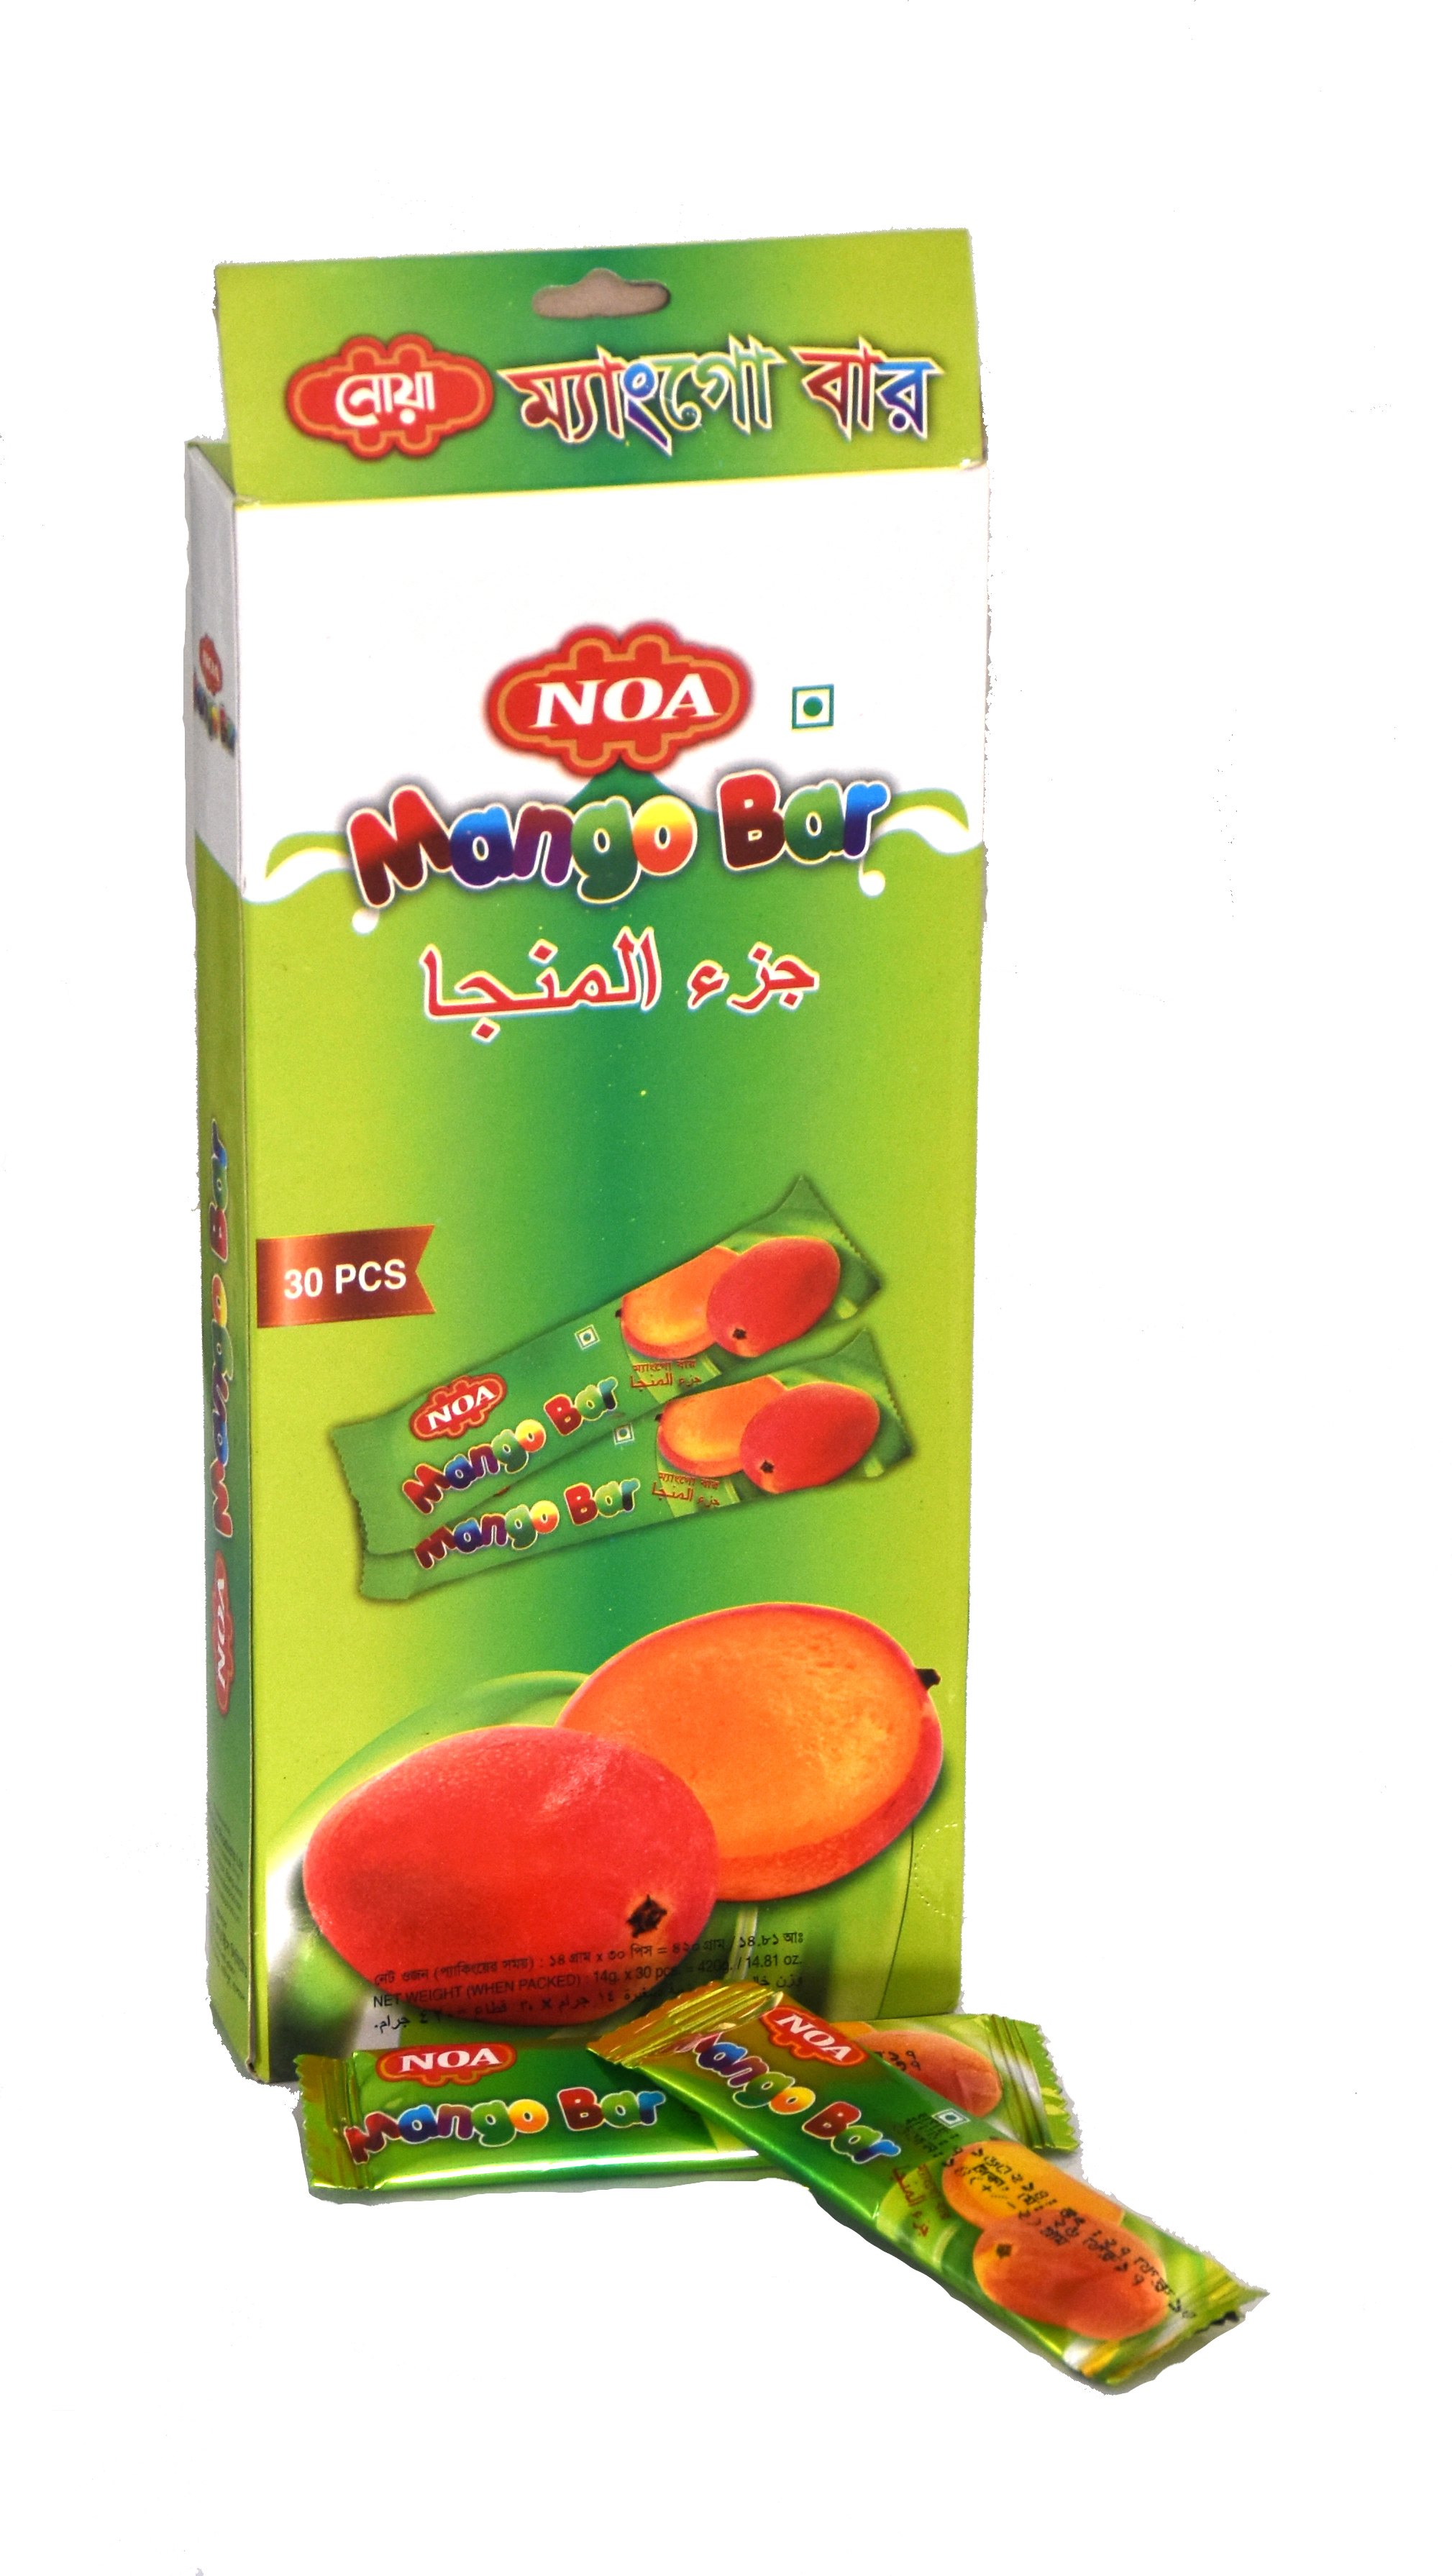 Noa Mango Bar